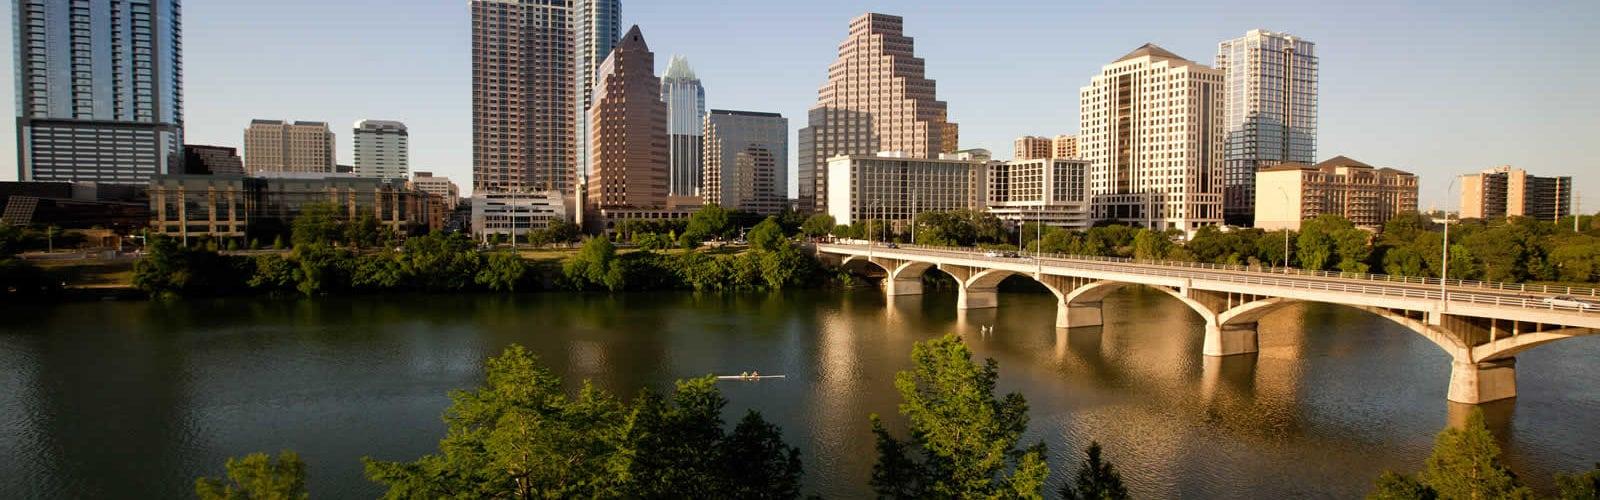 histoire-austin-texas-une